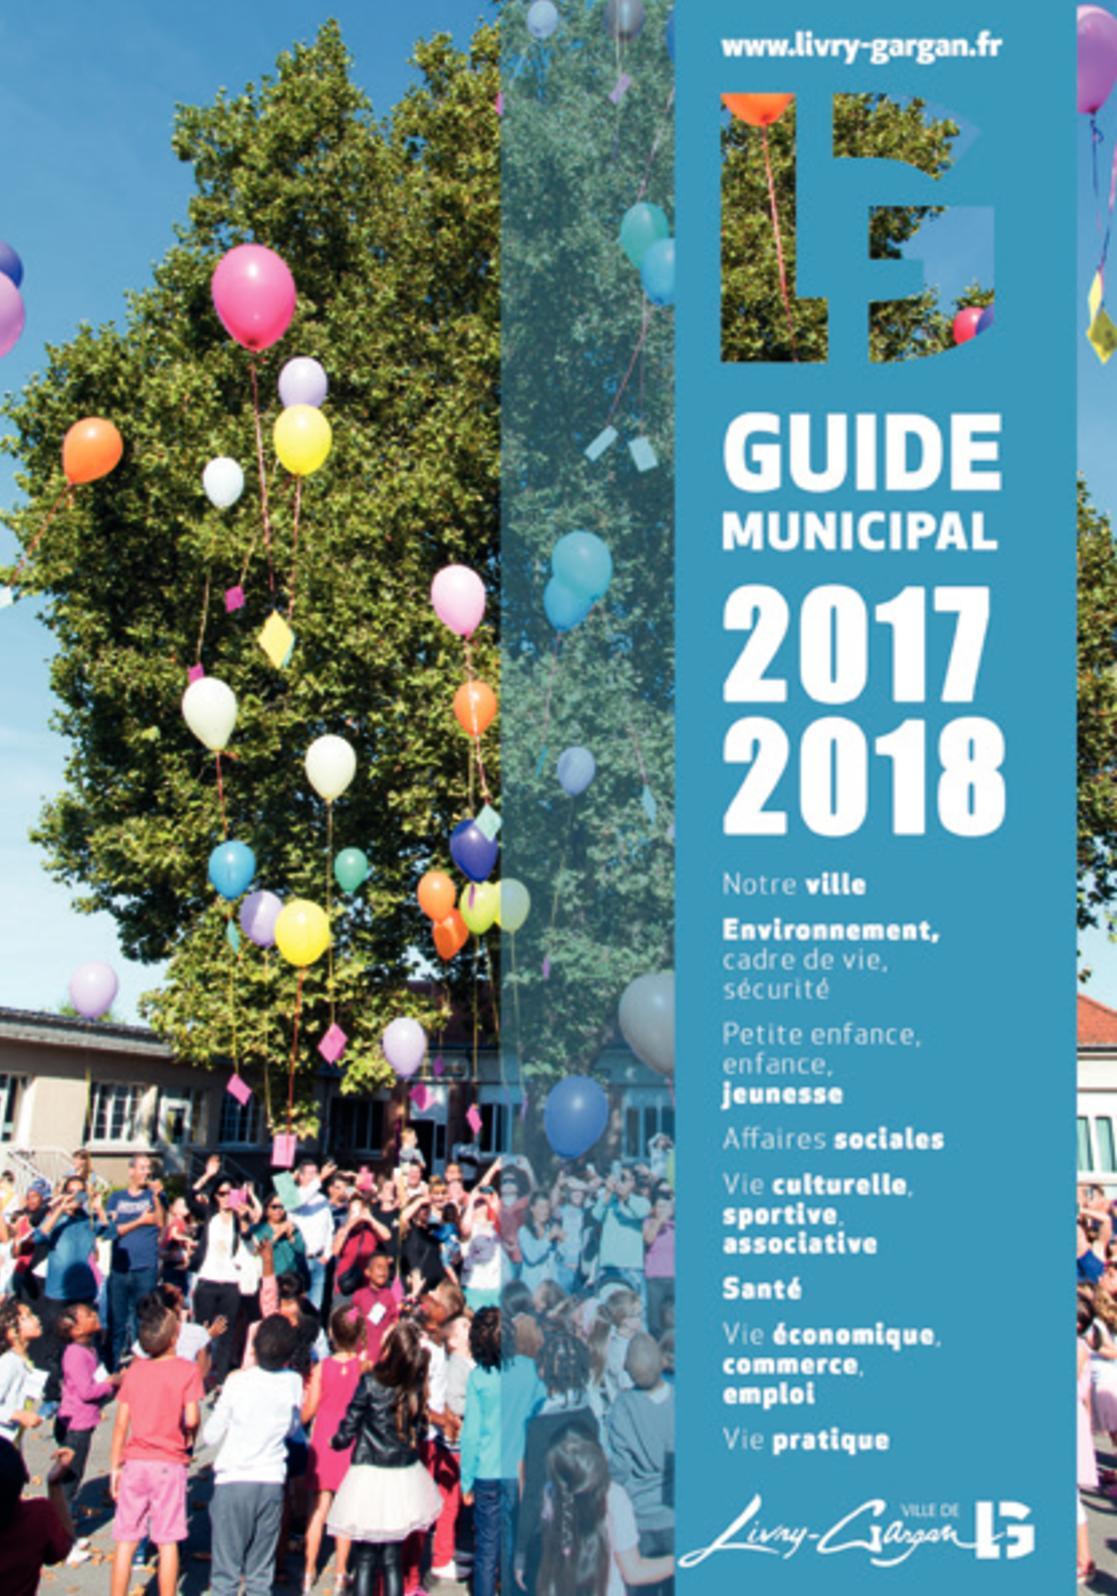 a172de47727 Calaméo - Guide Livry Gargan 2017